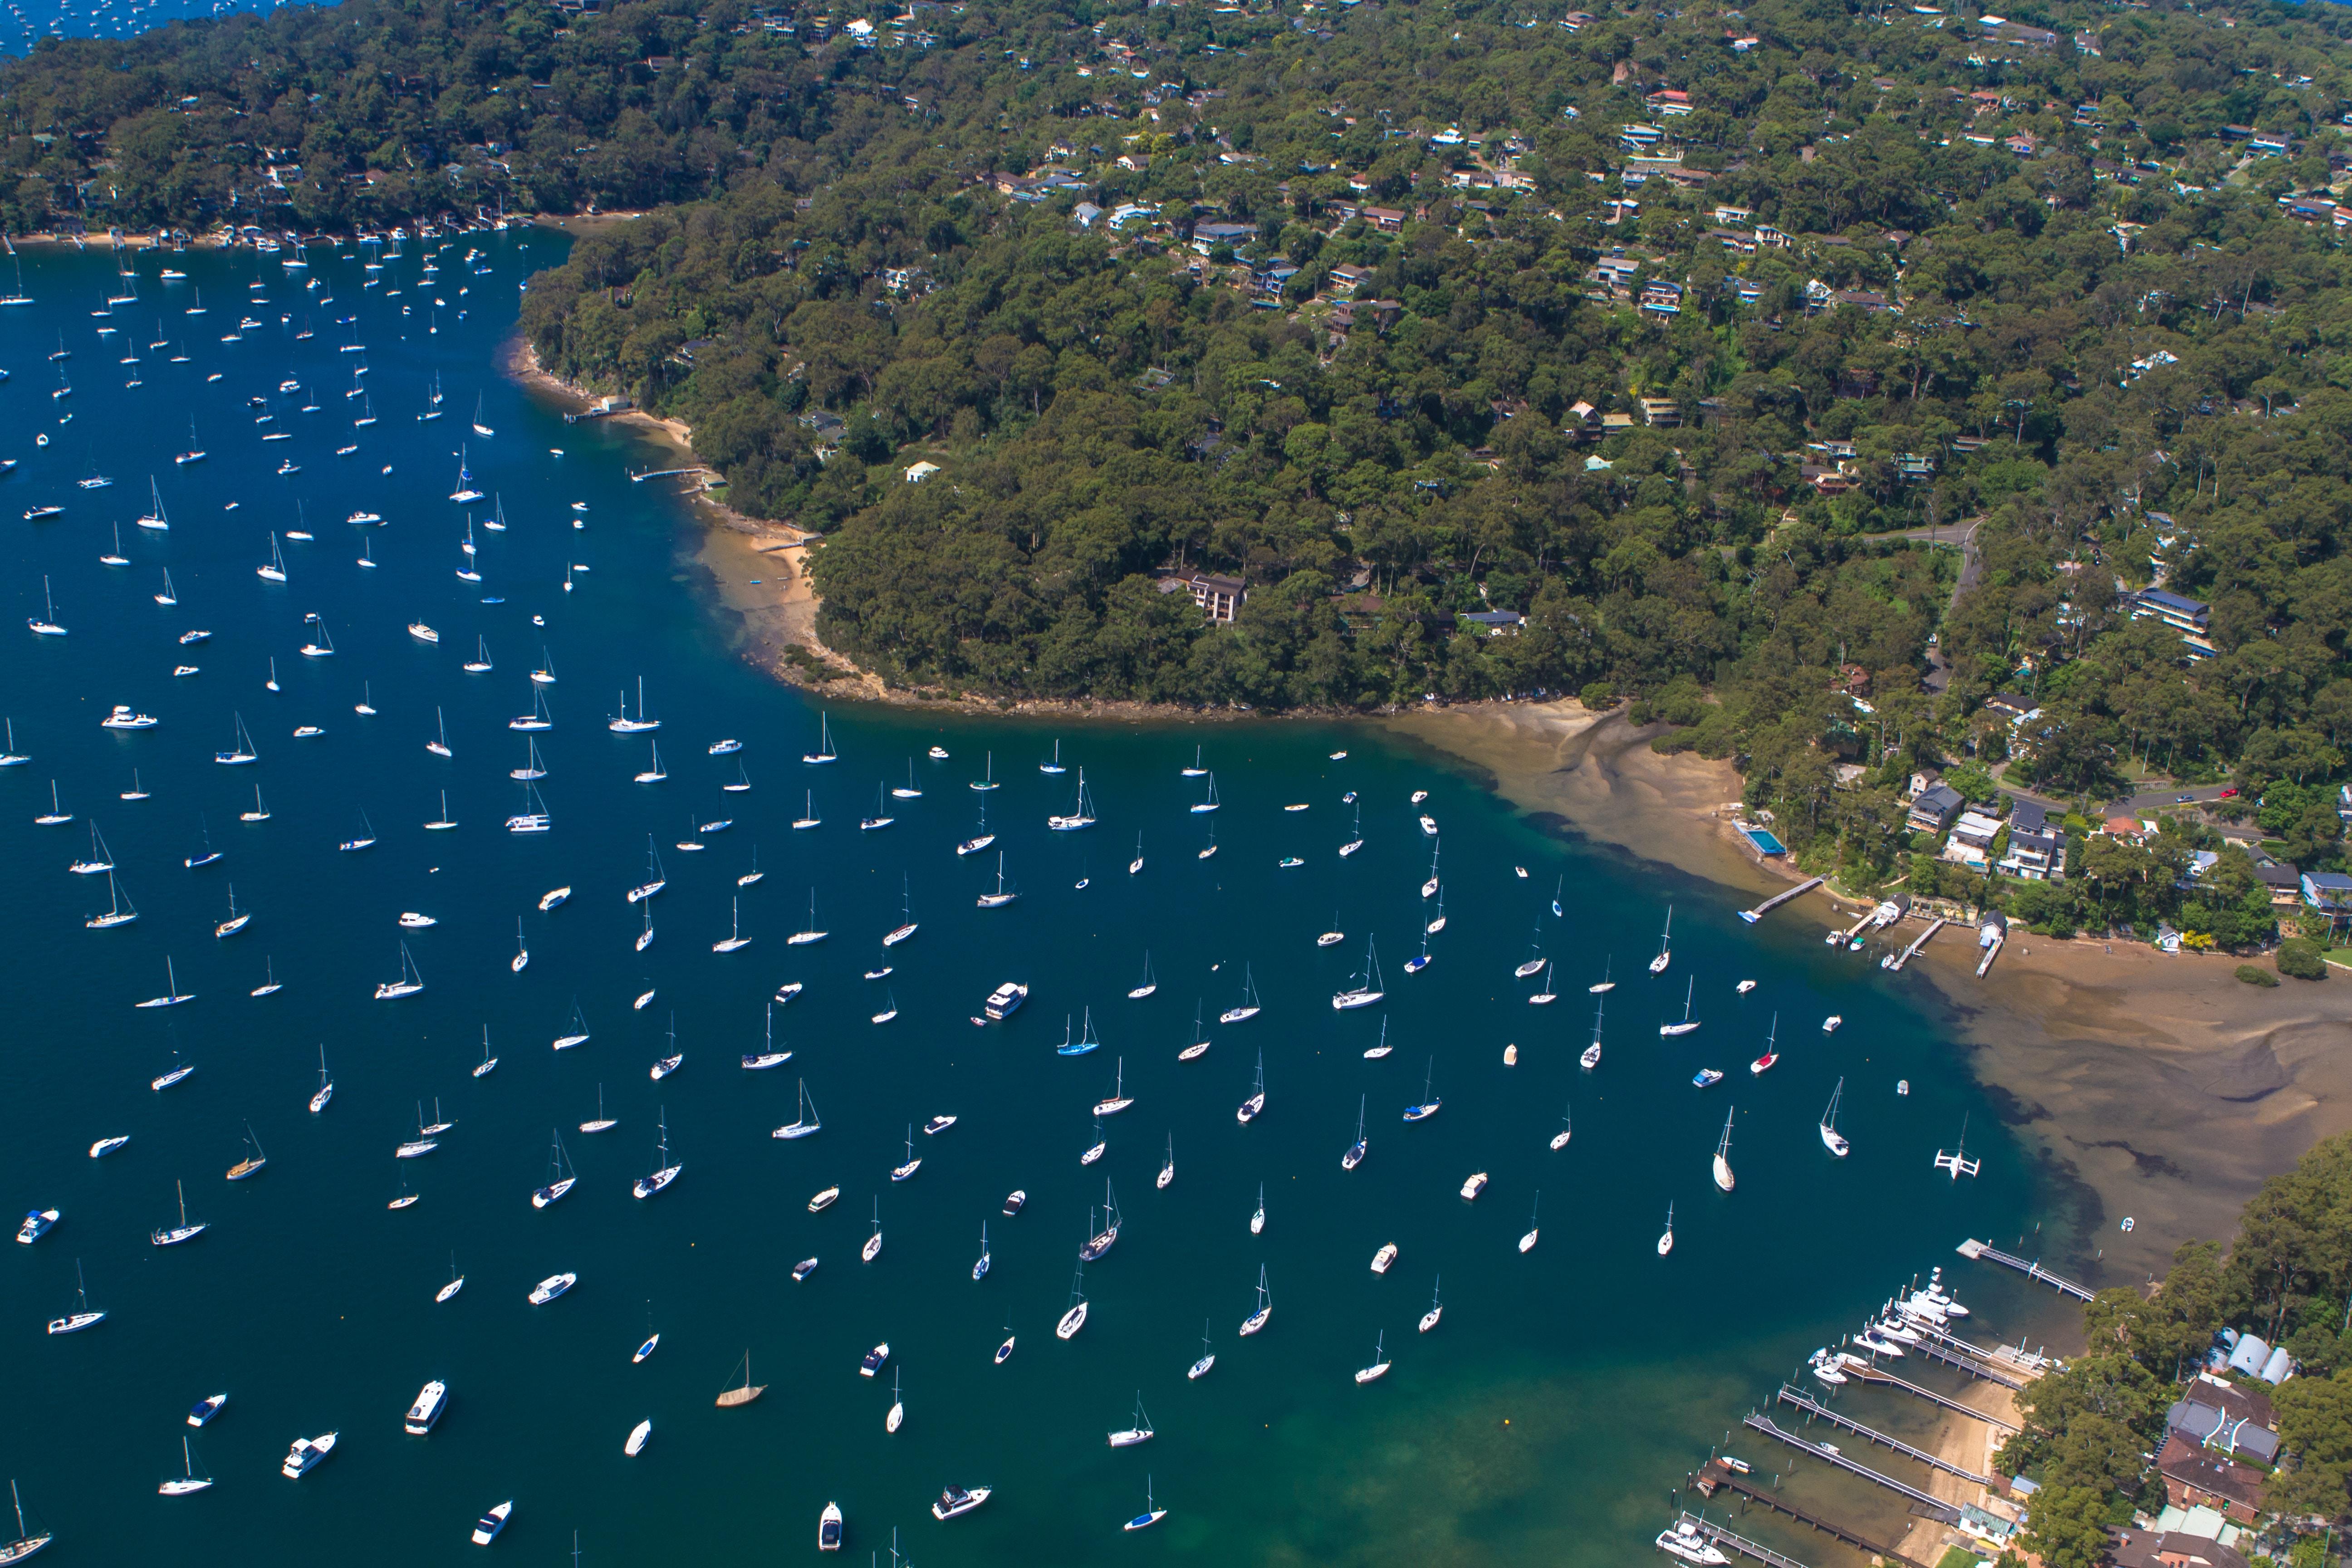 aerial photography of seashore near green grass trees